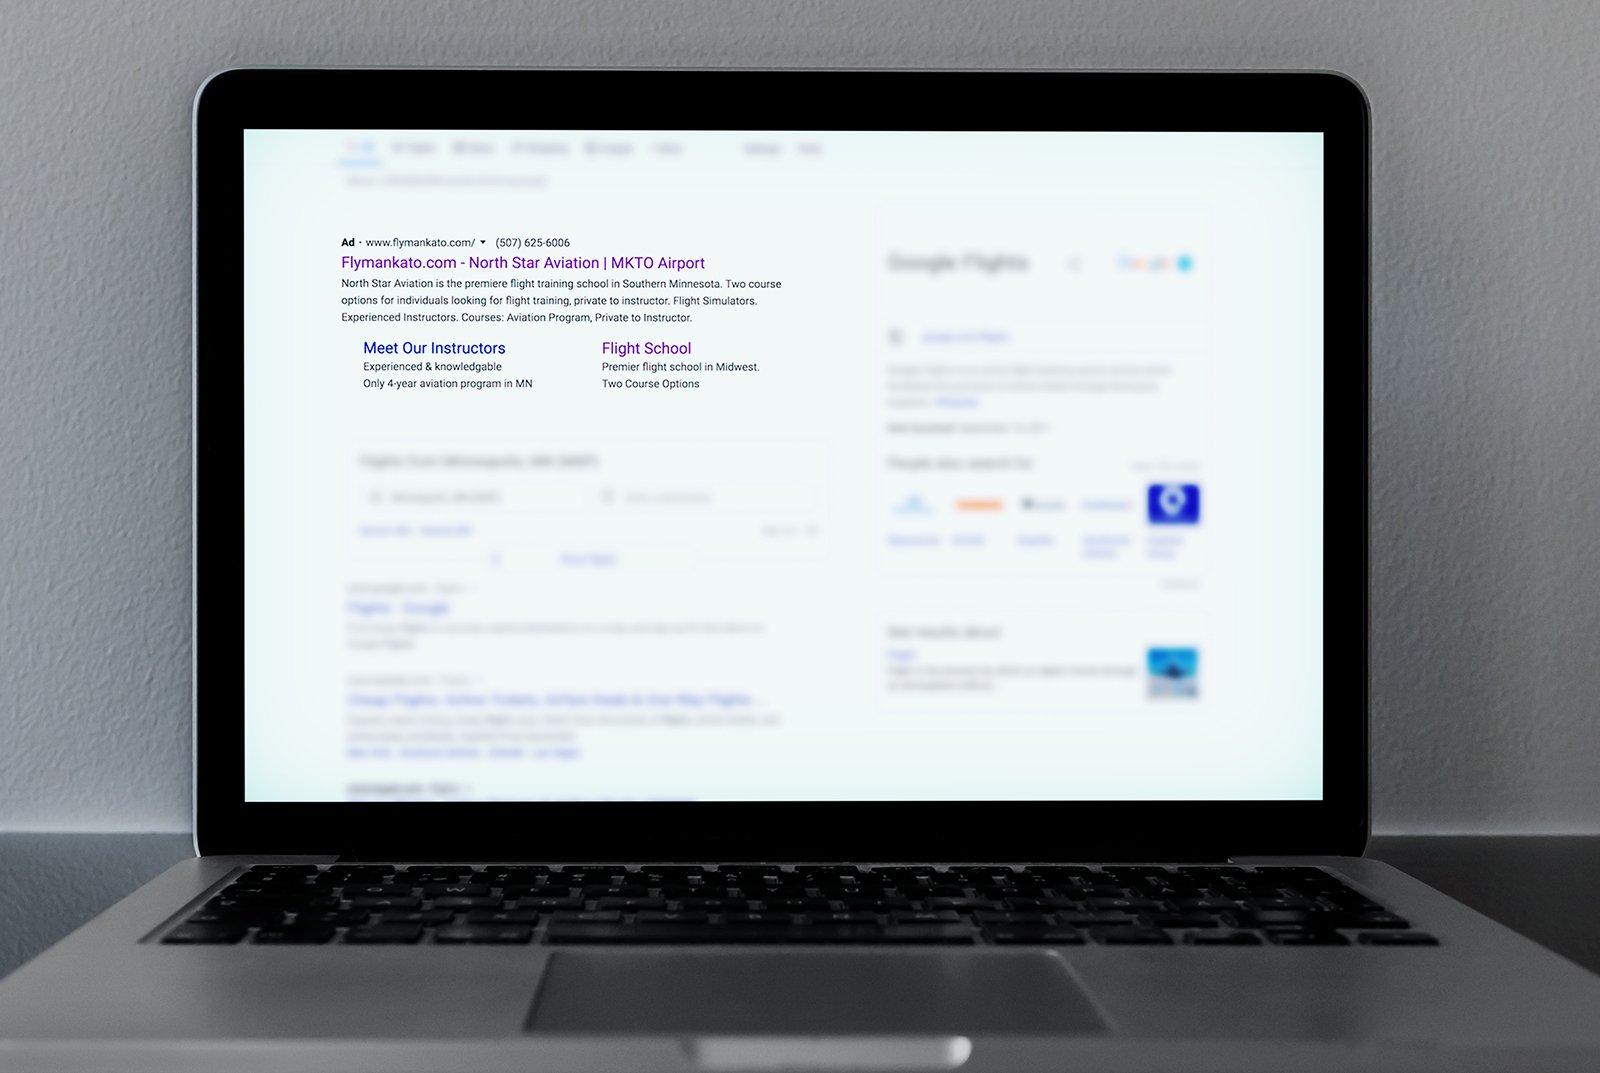 Fly Mankato Google Ads 6